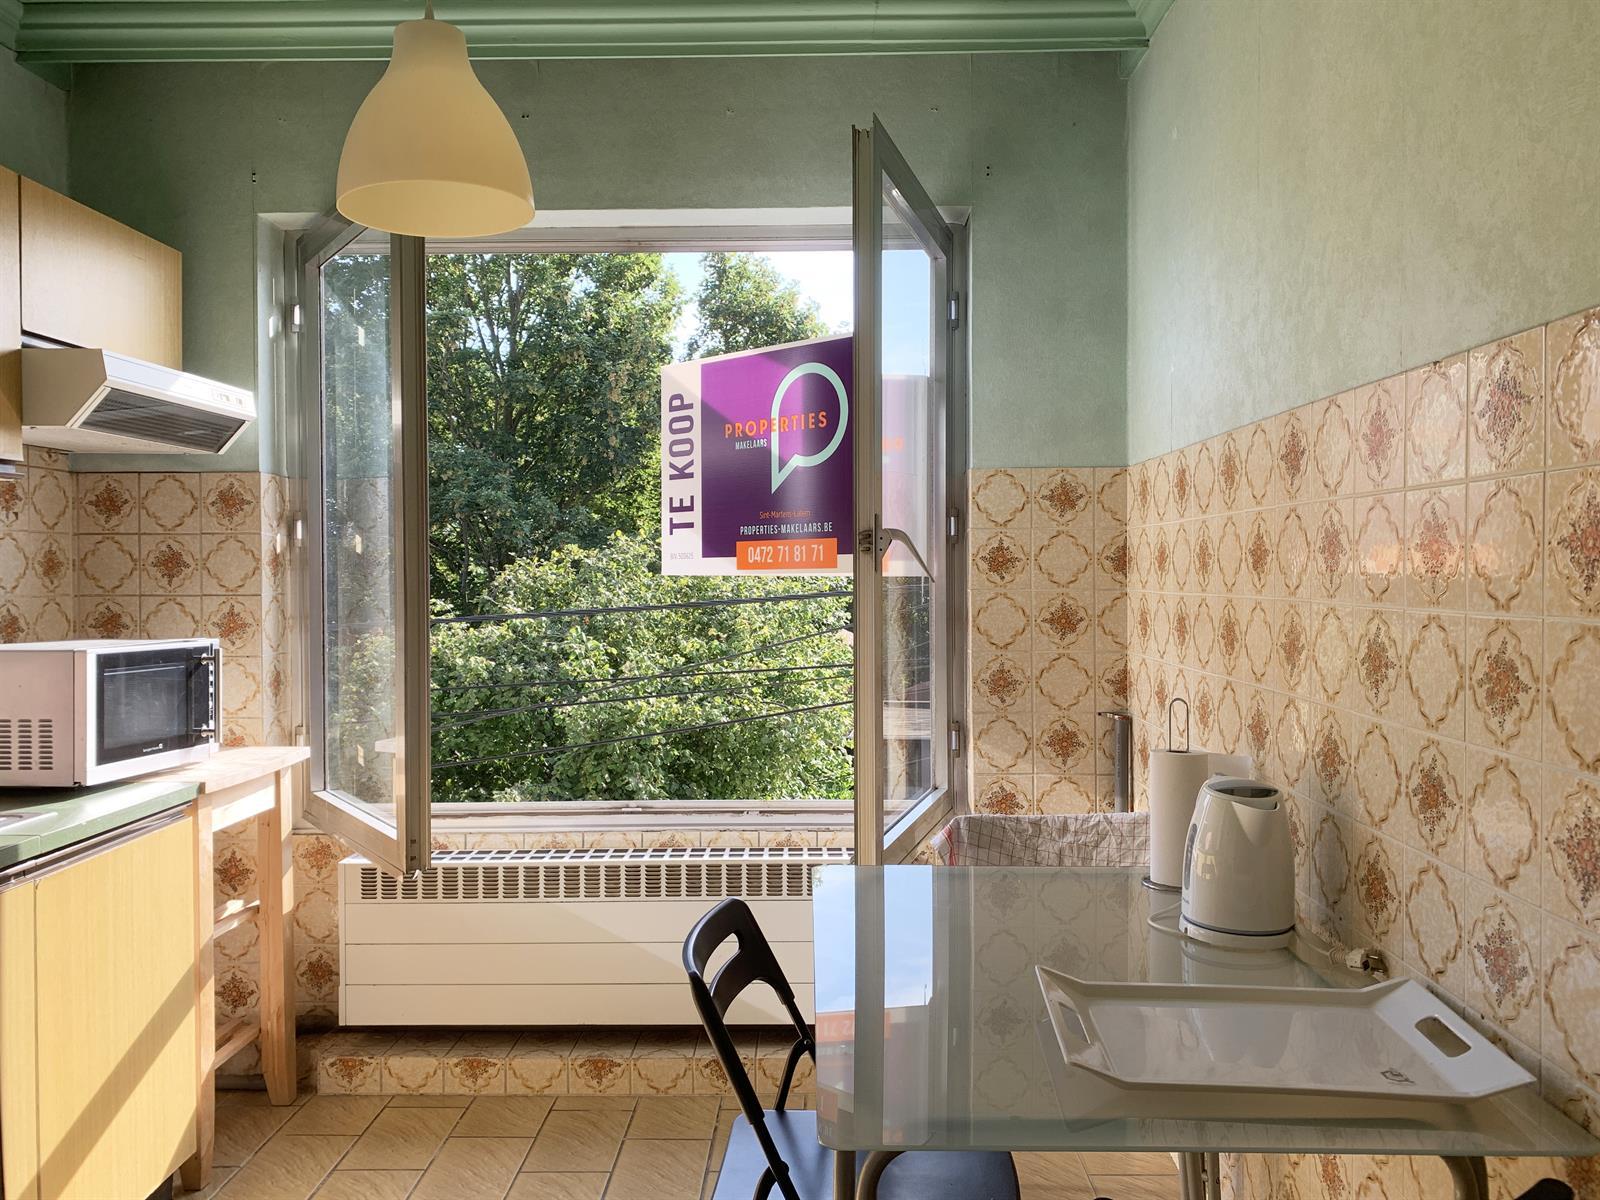 2-SLPK appartement in Serskamp